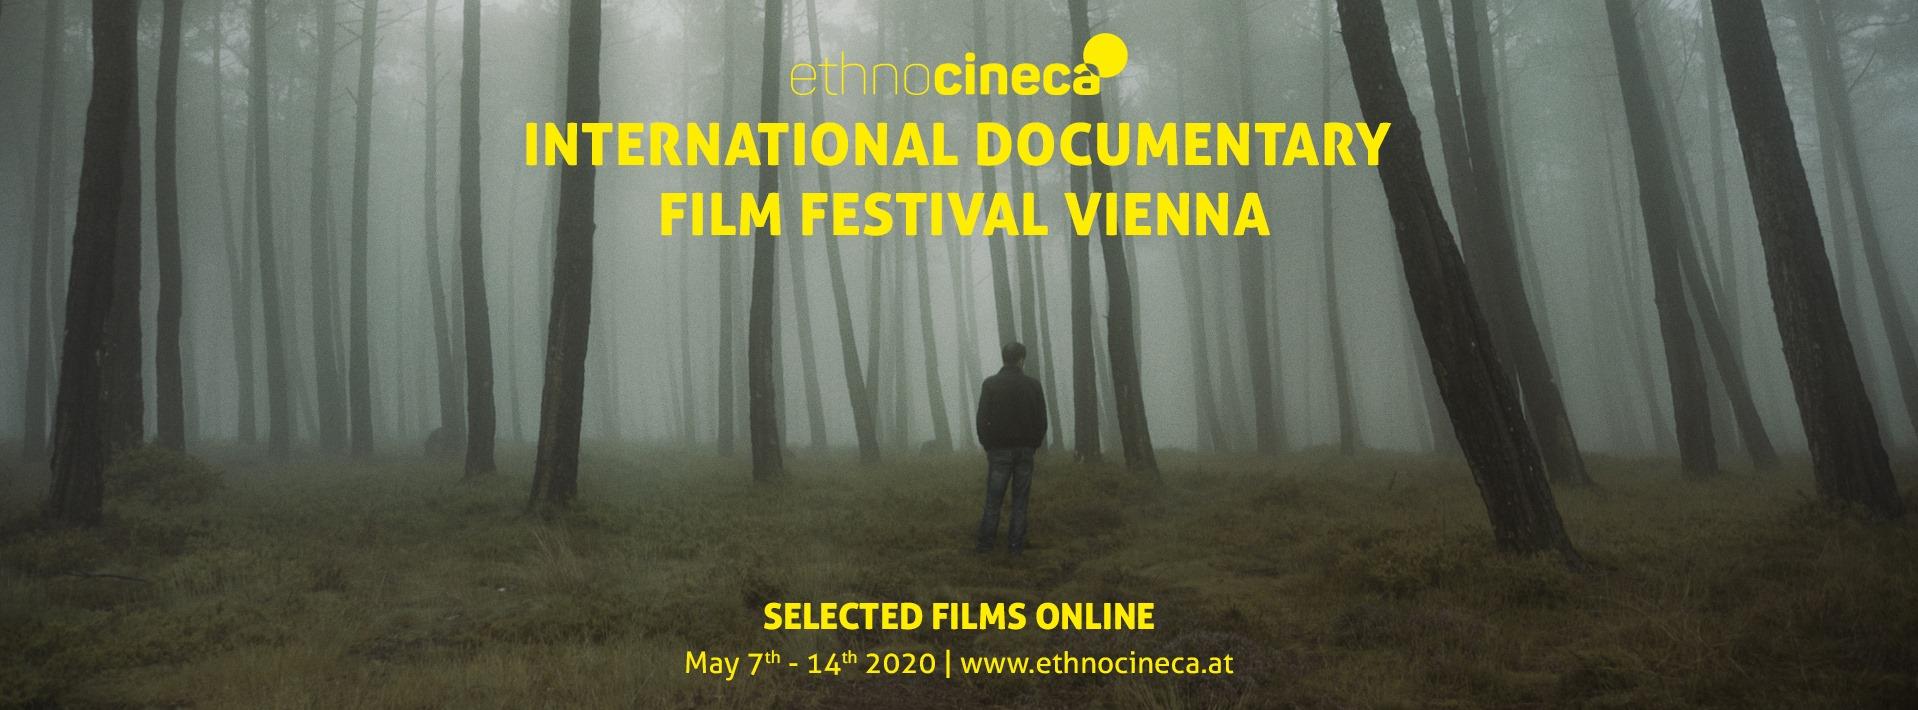 ethnocineca Film Festival Vienna